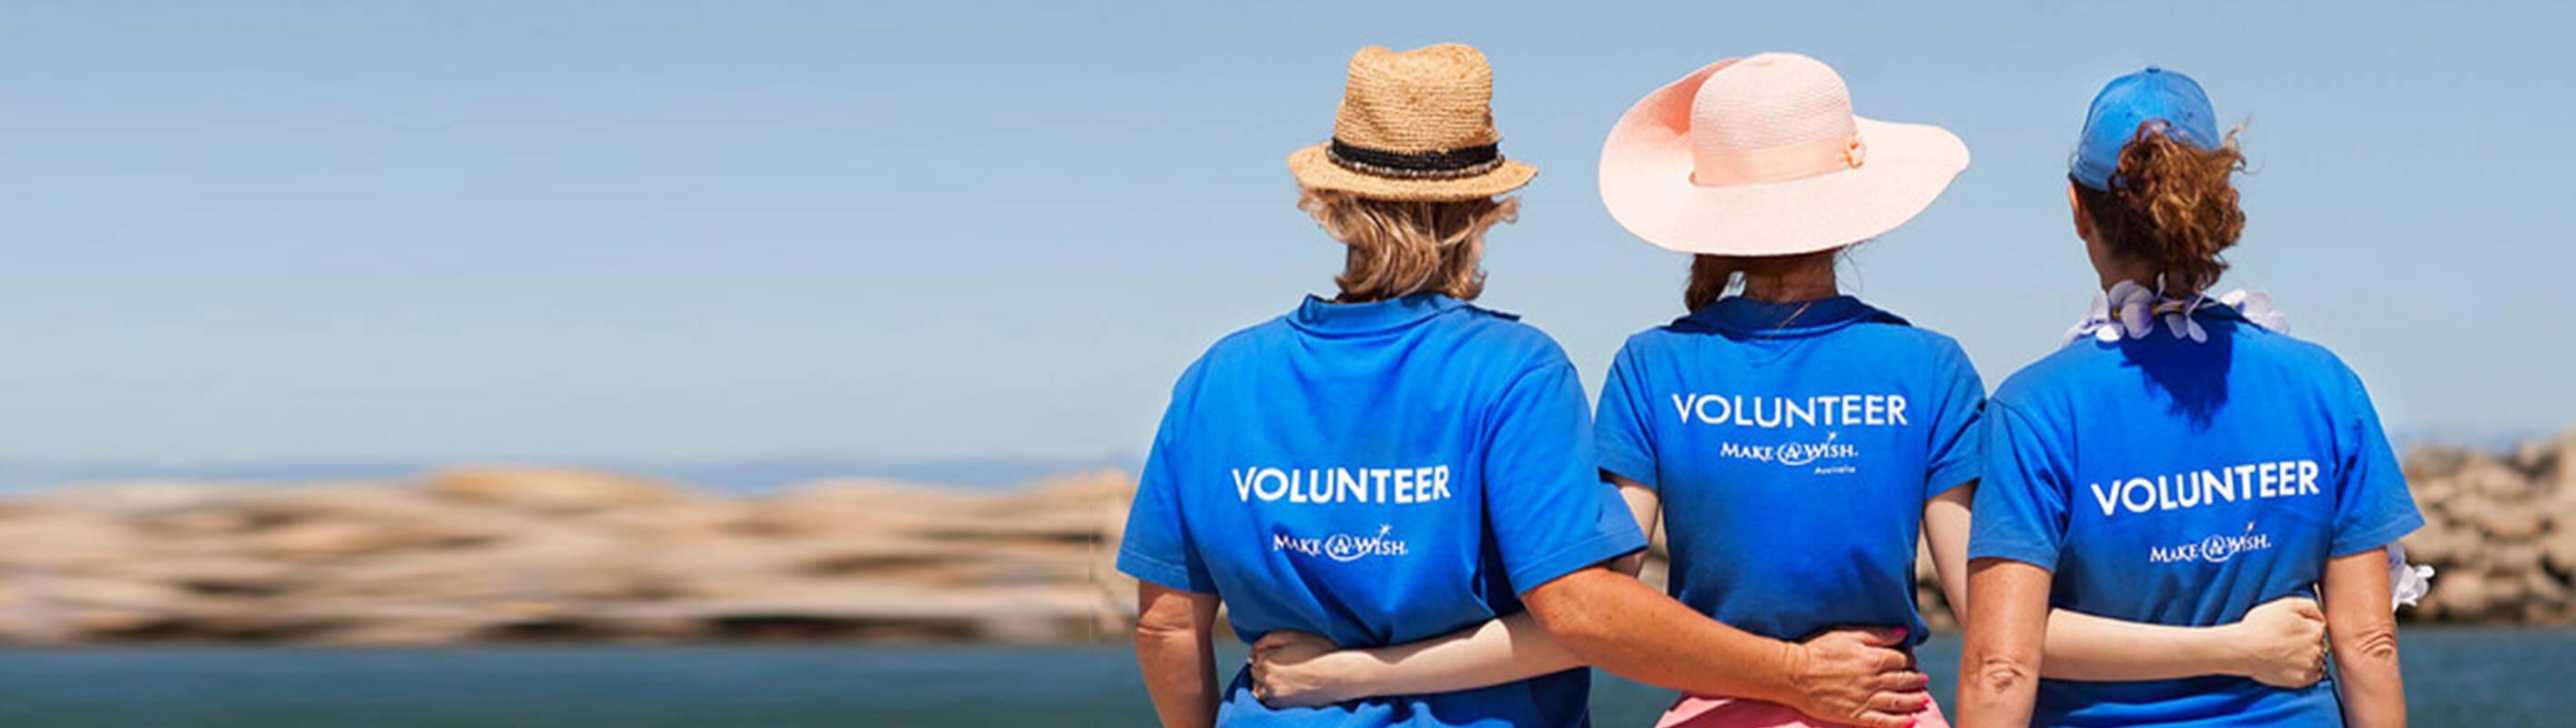 Make A Wish Australia, Children's Charity - The back of volunteers hugging wearing Make A Wish T-shirts